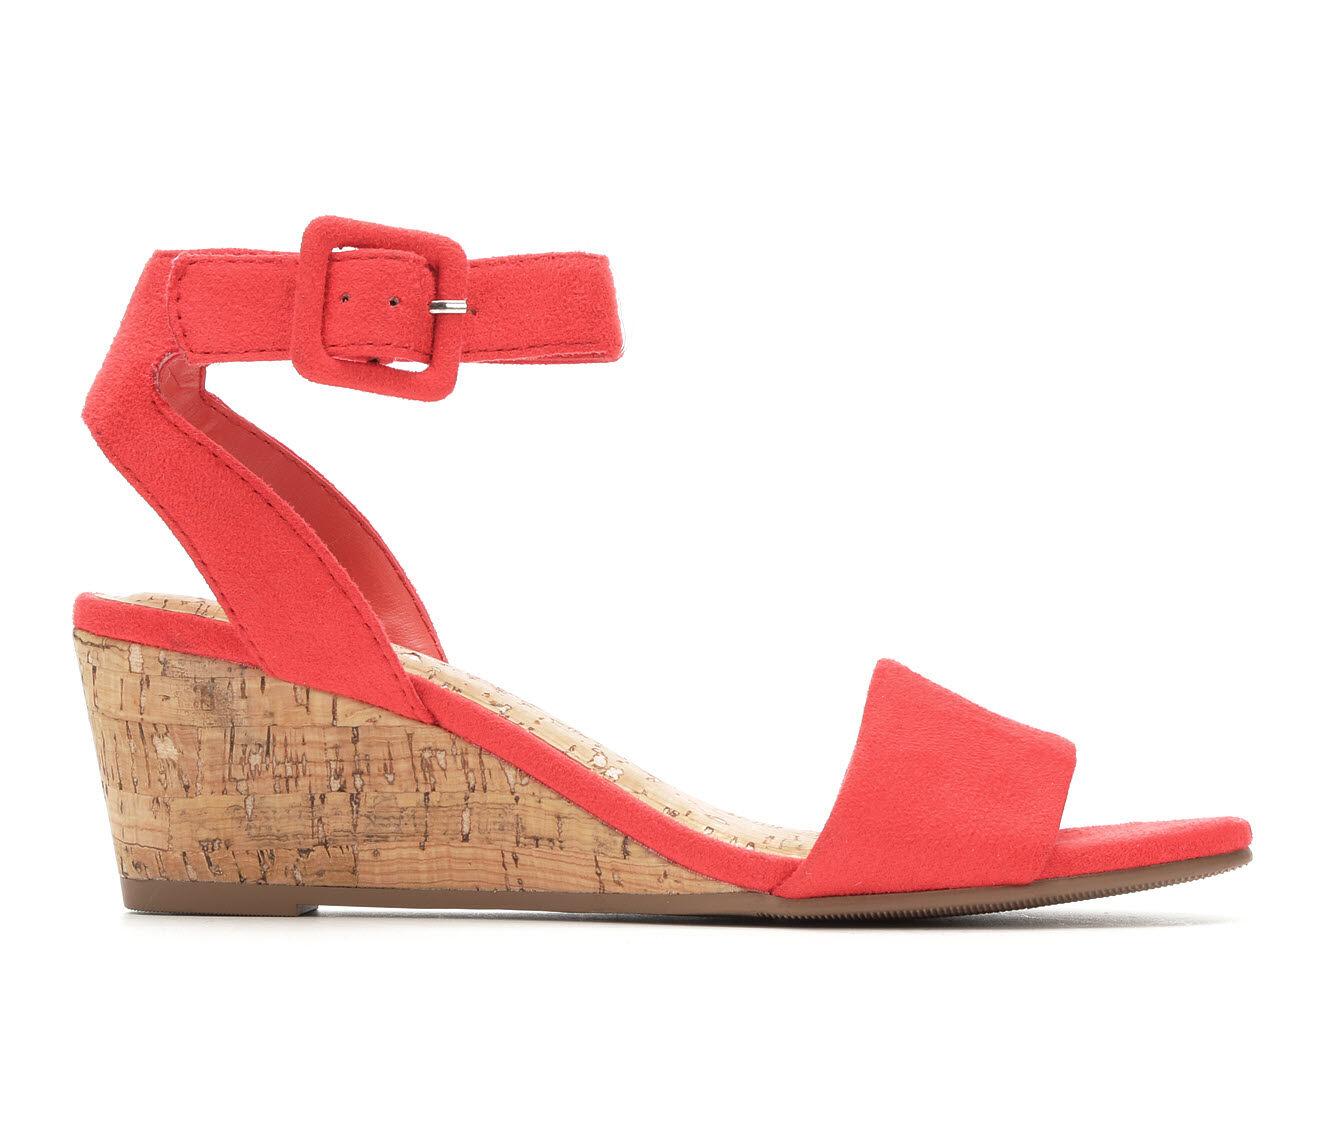 Top Quality Women's Solanz Ellie Wedge Sandals Watermelon Micr